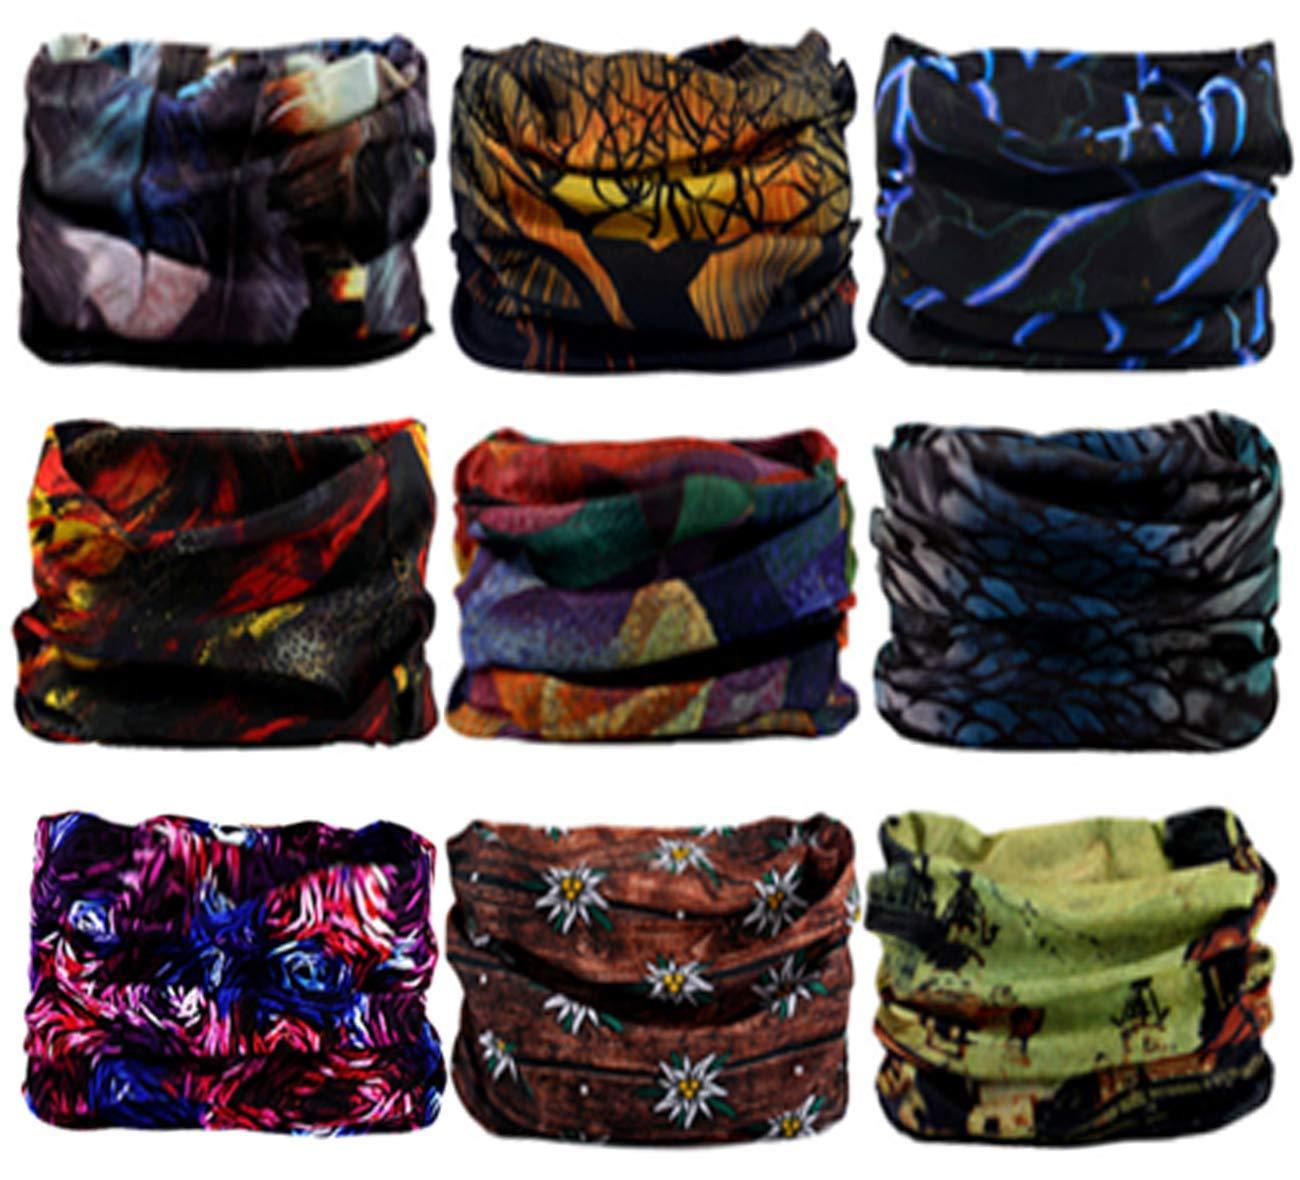 SmilerSmile 6pcs Assorted Seamless Outdoor Sport Bandanna Headwrap Scarf Wrap, 12 in 2 High Elastic Magic Headband & Collars Muffler Scarf Face Mask UV Resistance(17 Tender Night)